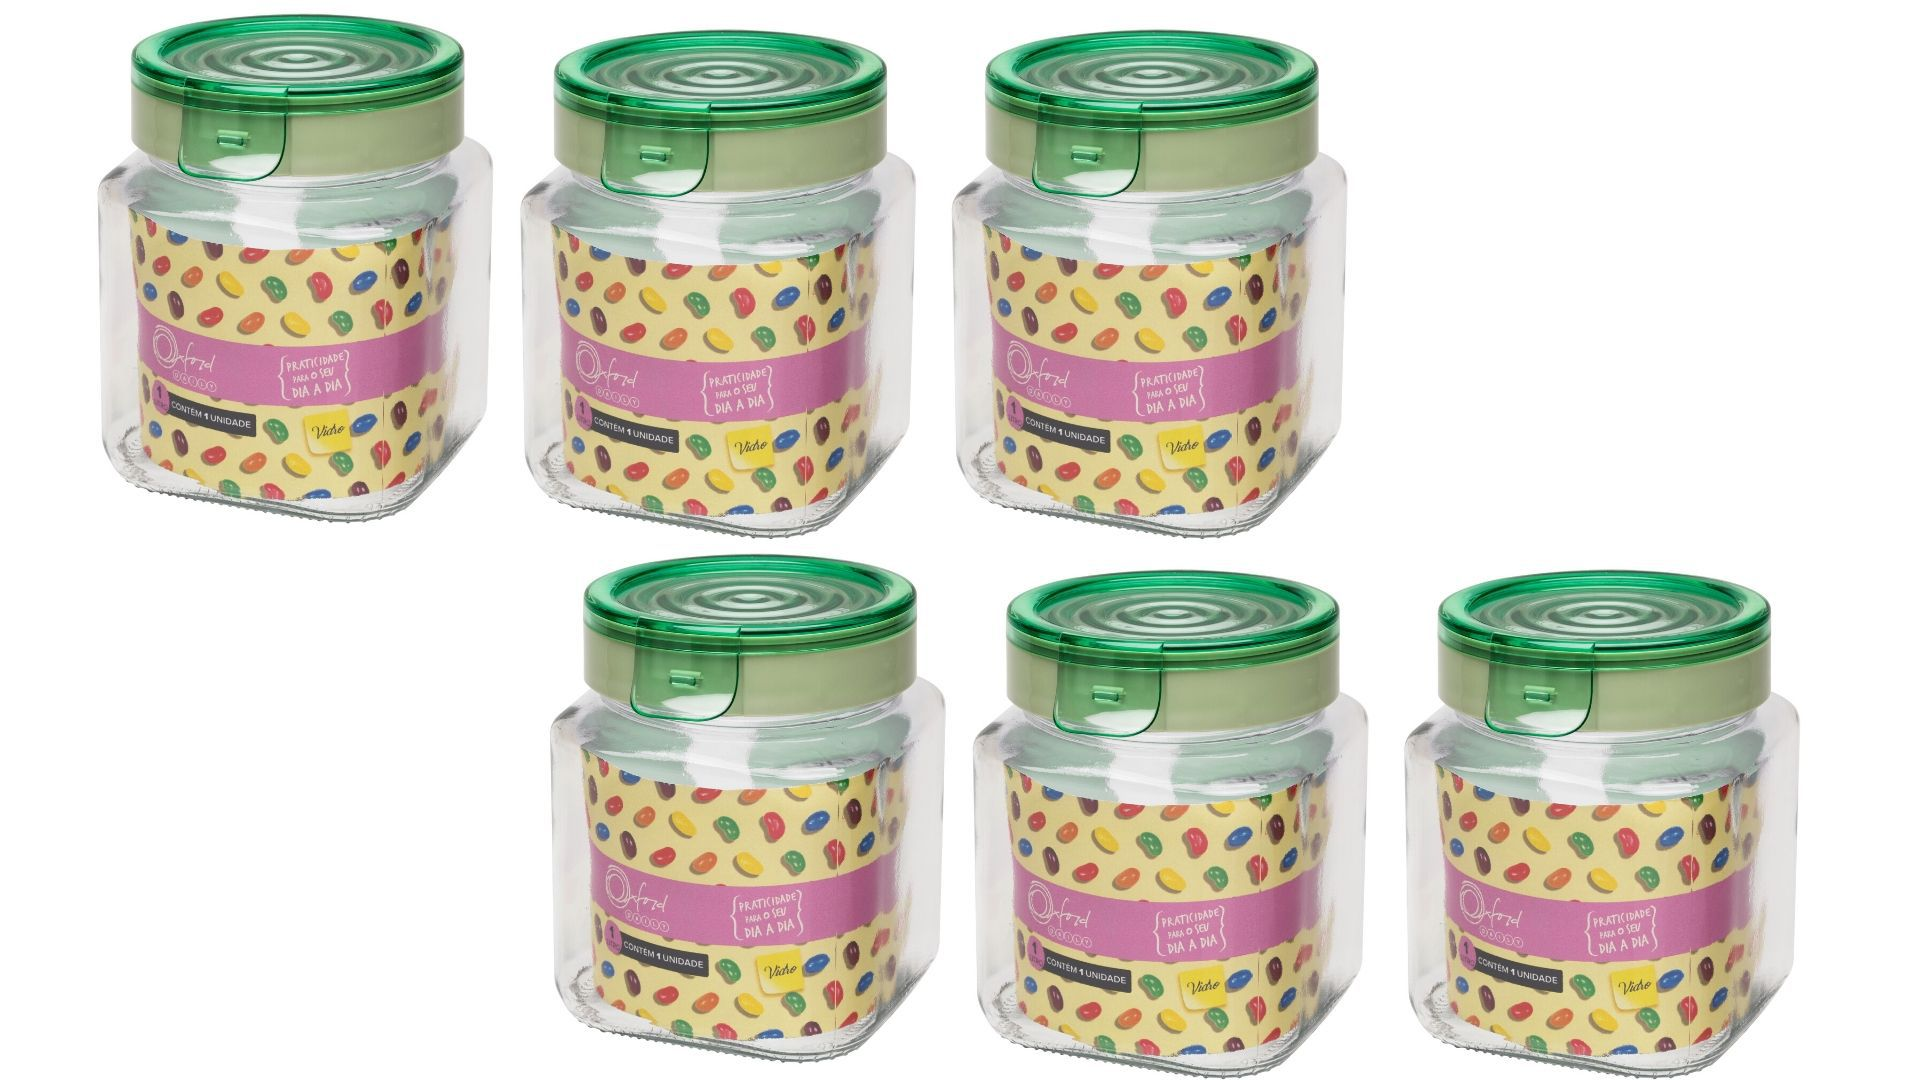 Conjunto De 6 Potes Herméticos De Vidro 1 Litro P/ Mantimentos Oxford